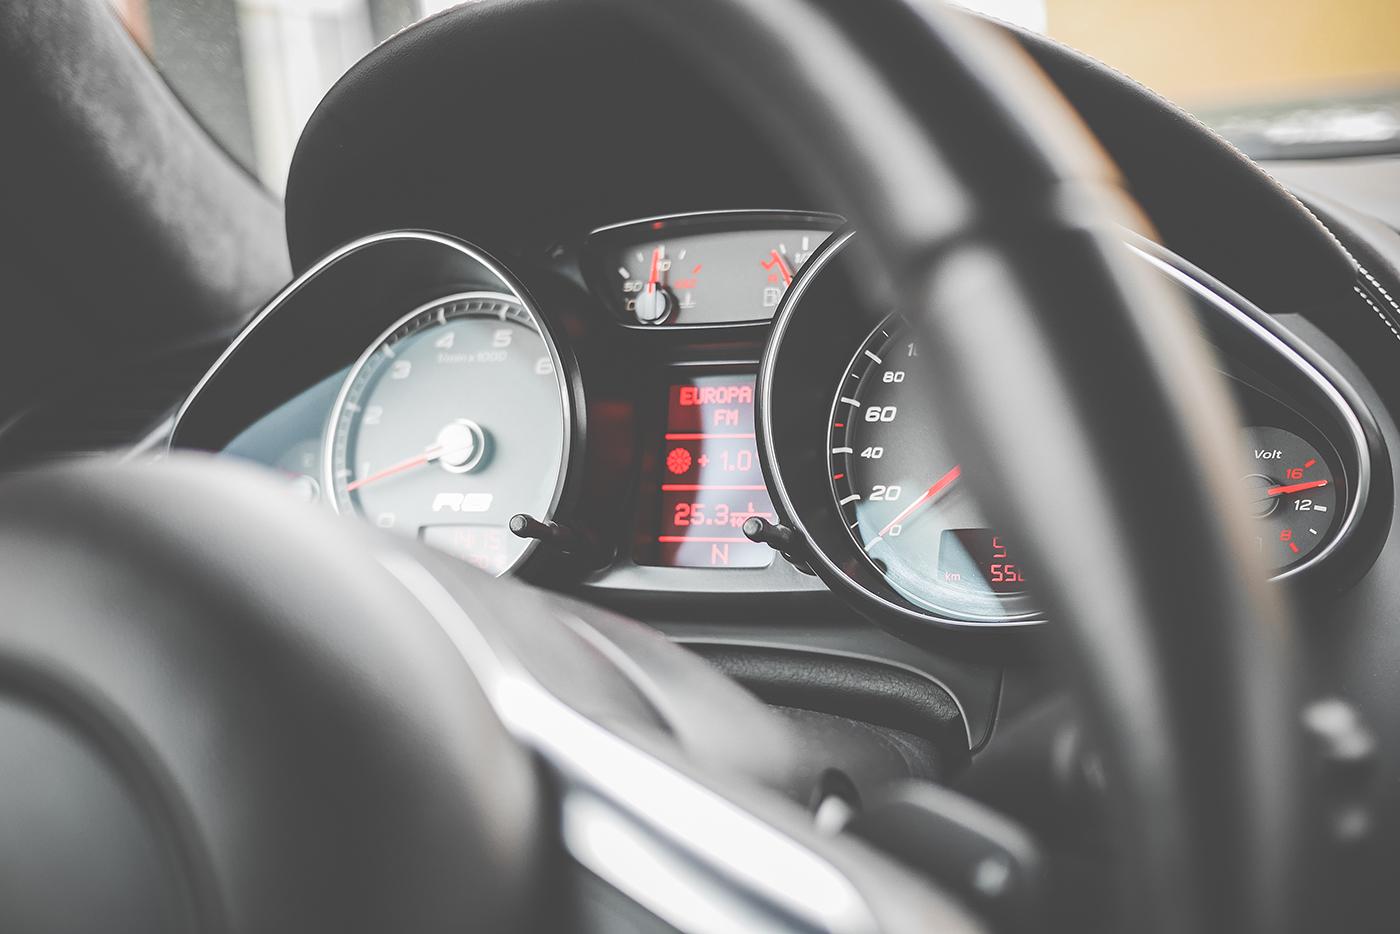 http://autobedrijfsmits.nl/wp-content/uploads/2016/12/sport-car-black-dashboard-picjumbo-com.jpg